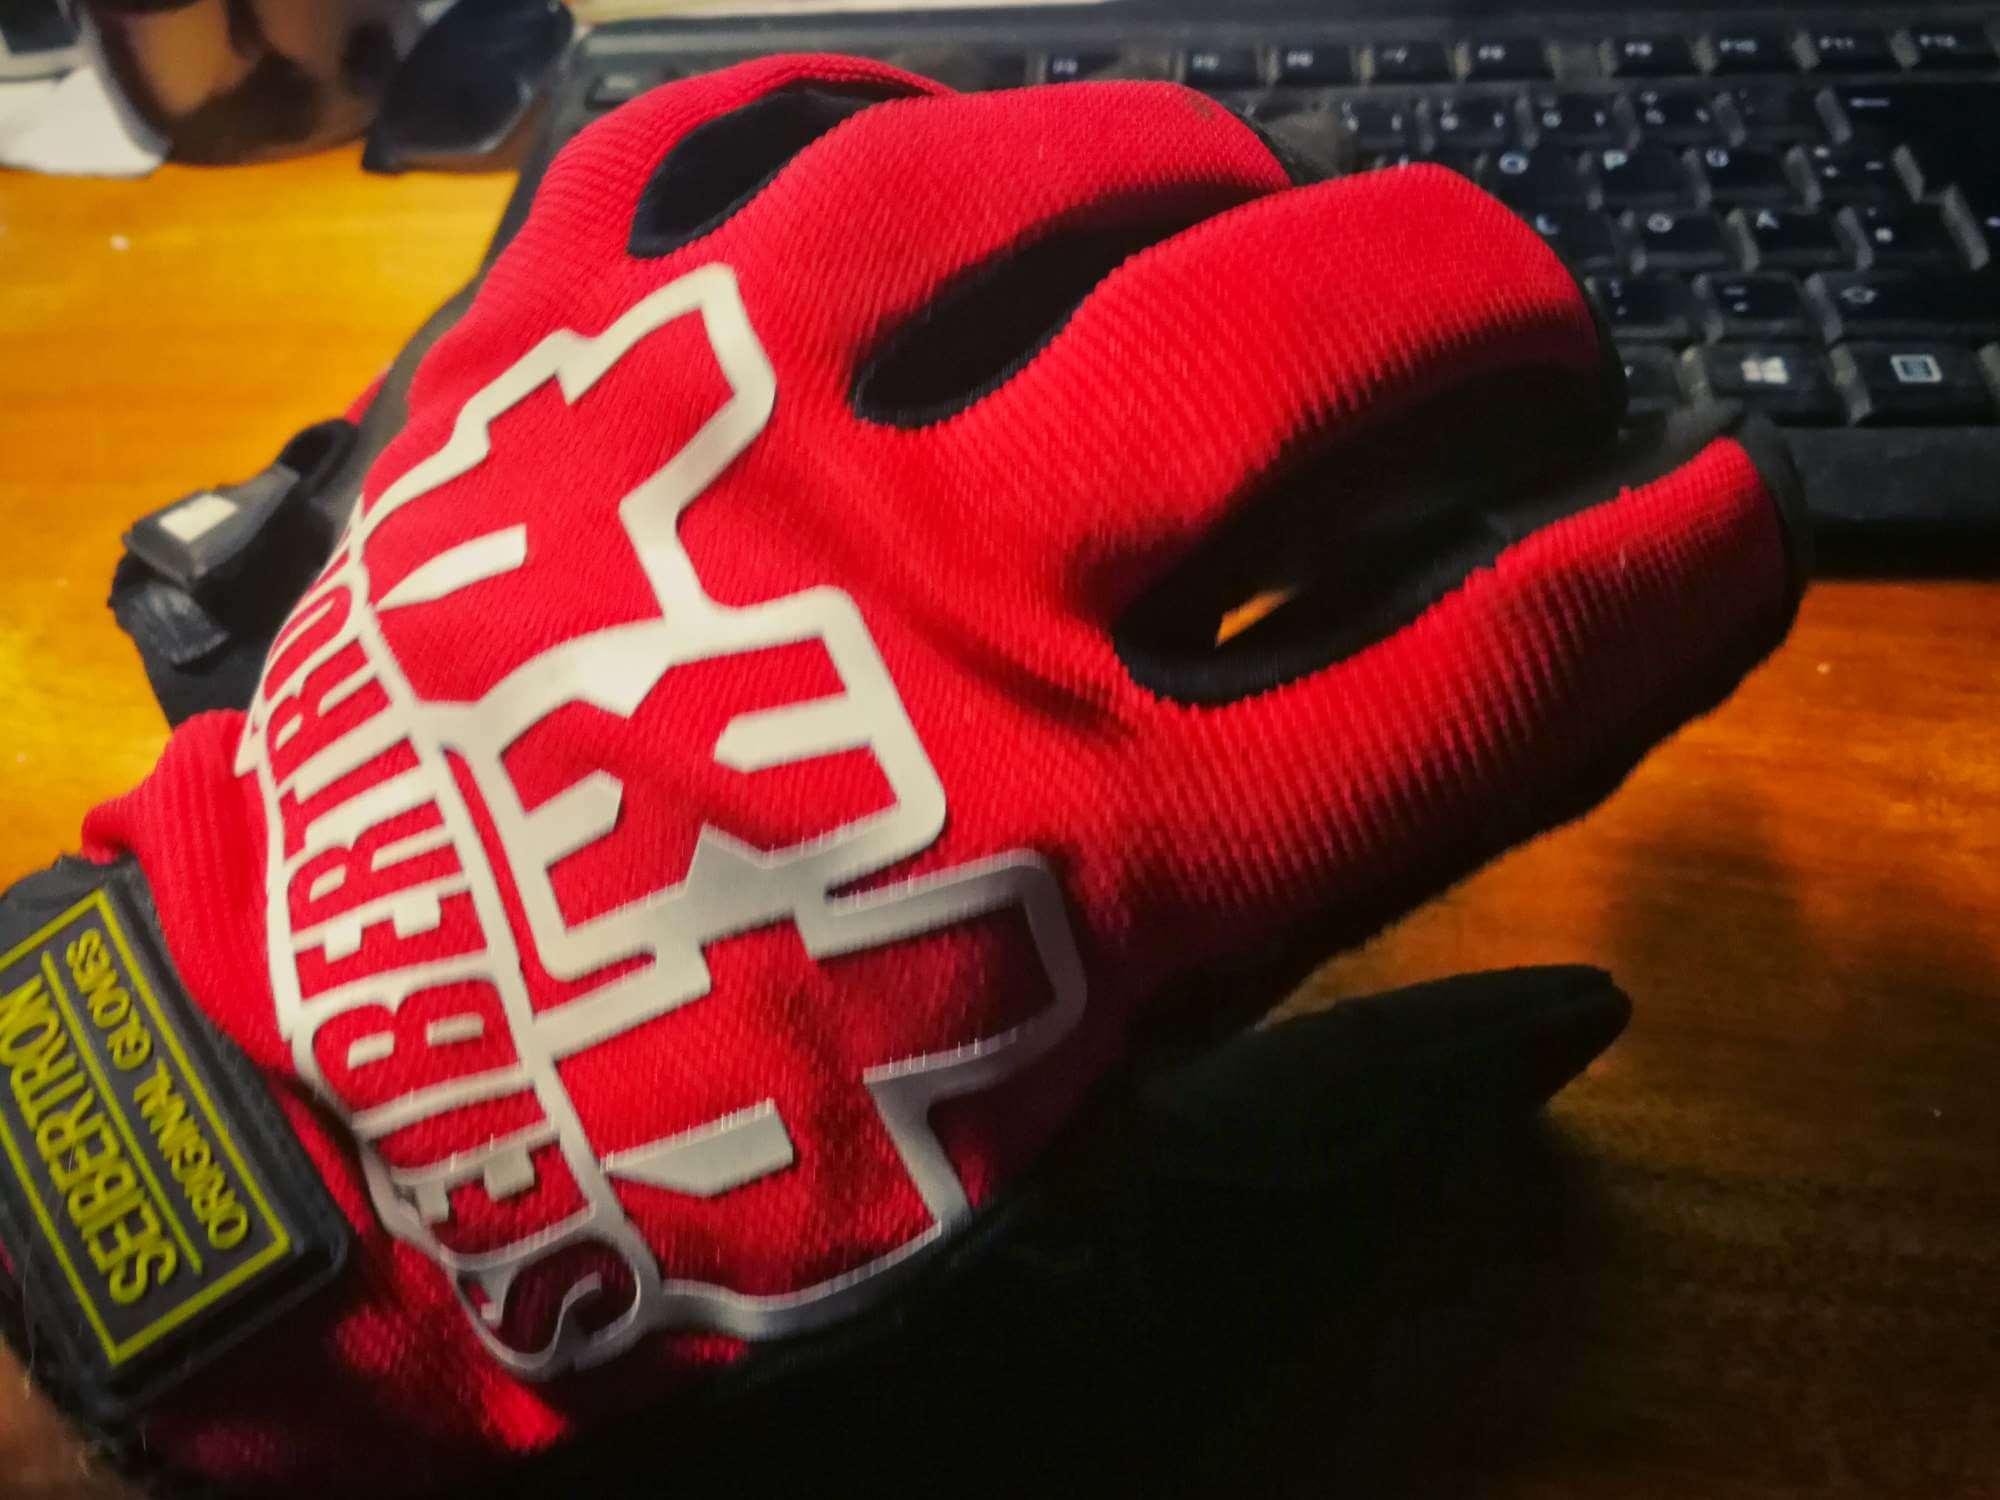 EDC Handschuhe Seibertron Utility